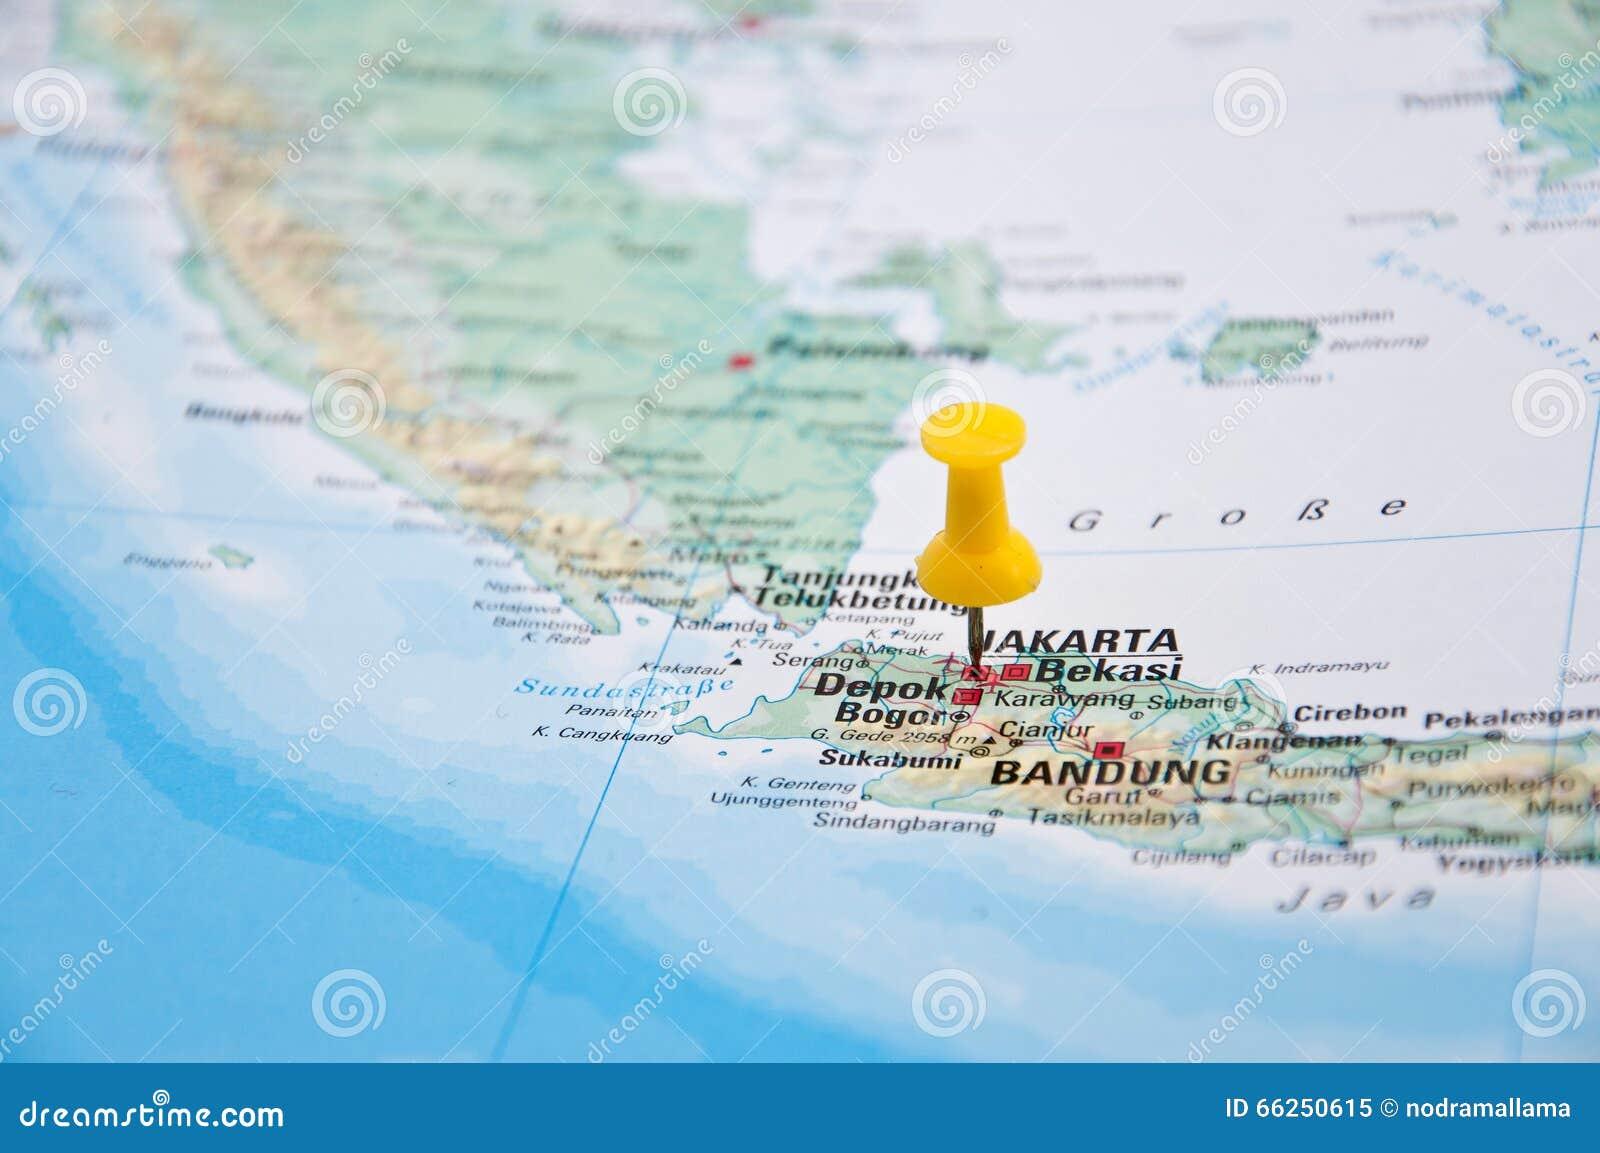 Jakarta, Java, Indonesia, Yellow Pin, Close-Up Of Map. Stock Photo ...